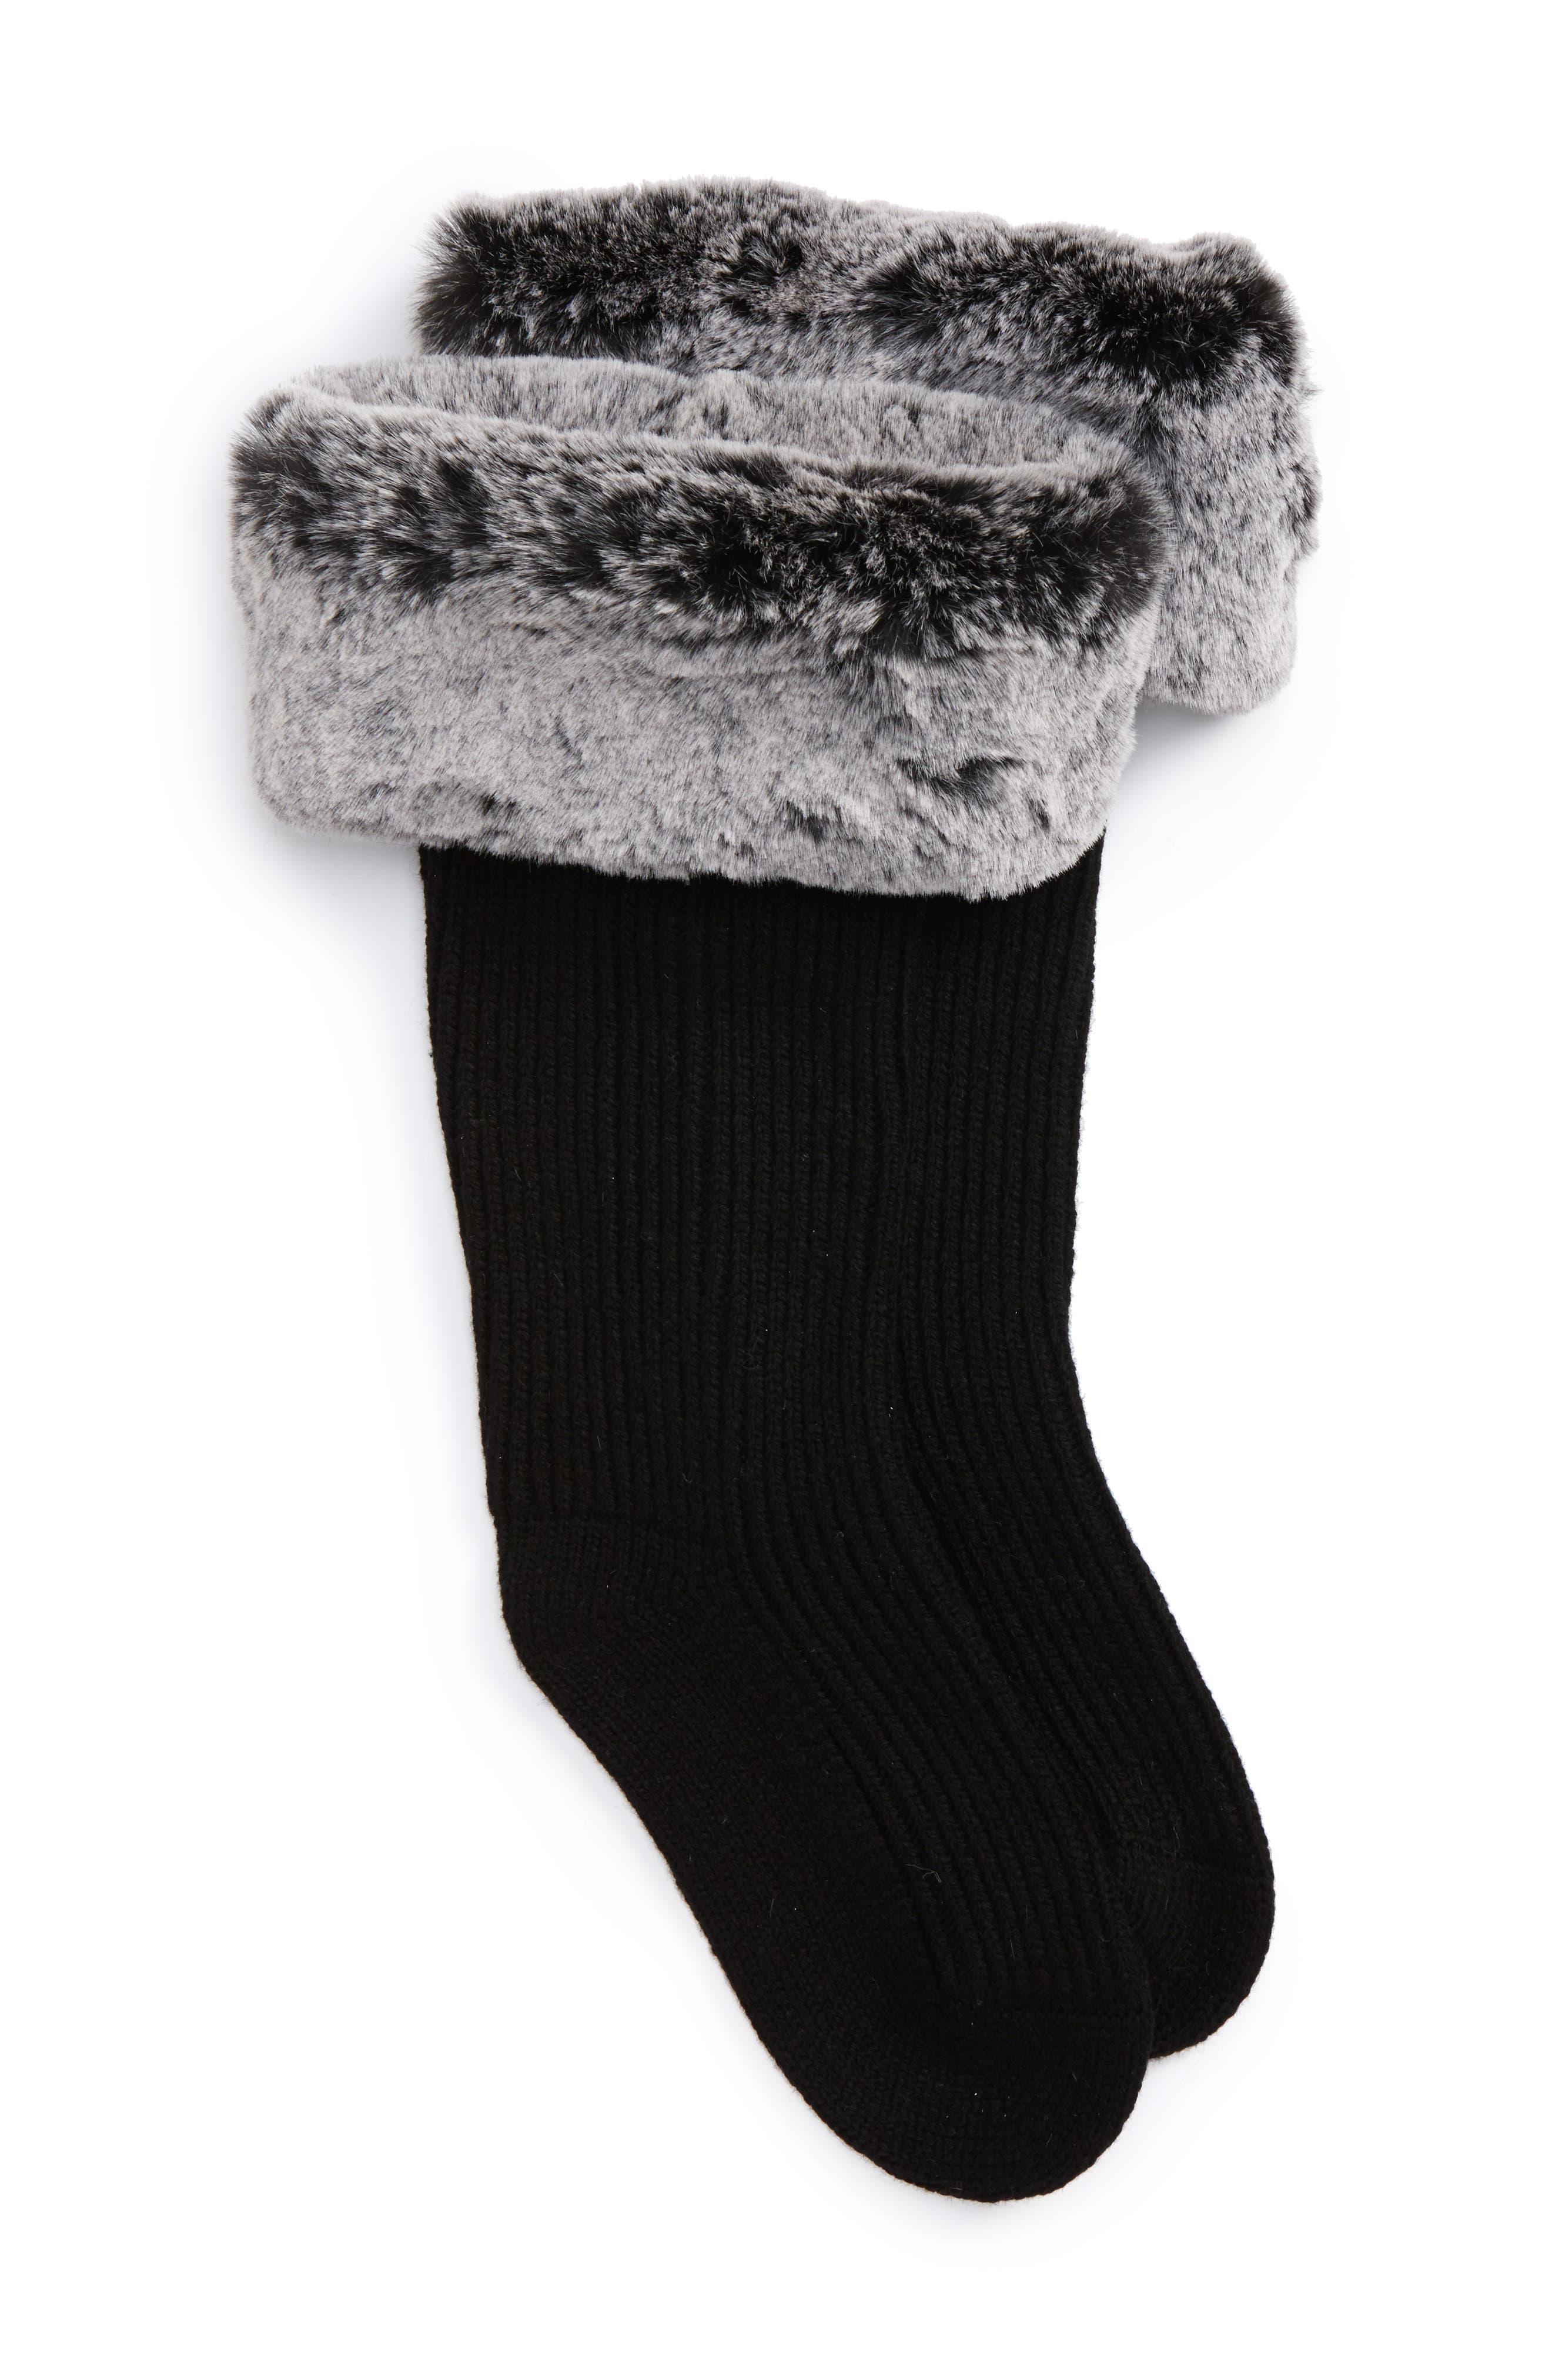 Main Image - UGG® UGGpure™ Tall Rain Boot Sock (Women)